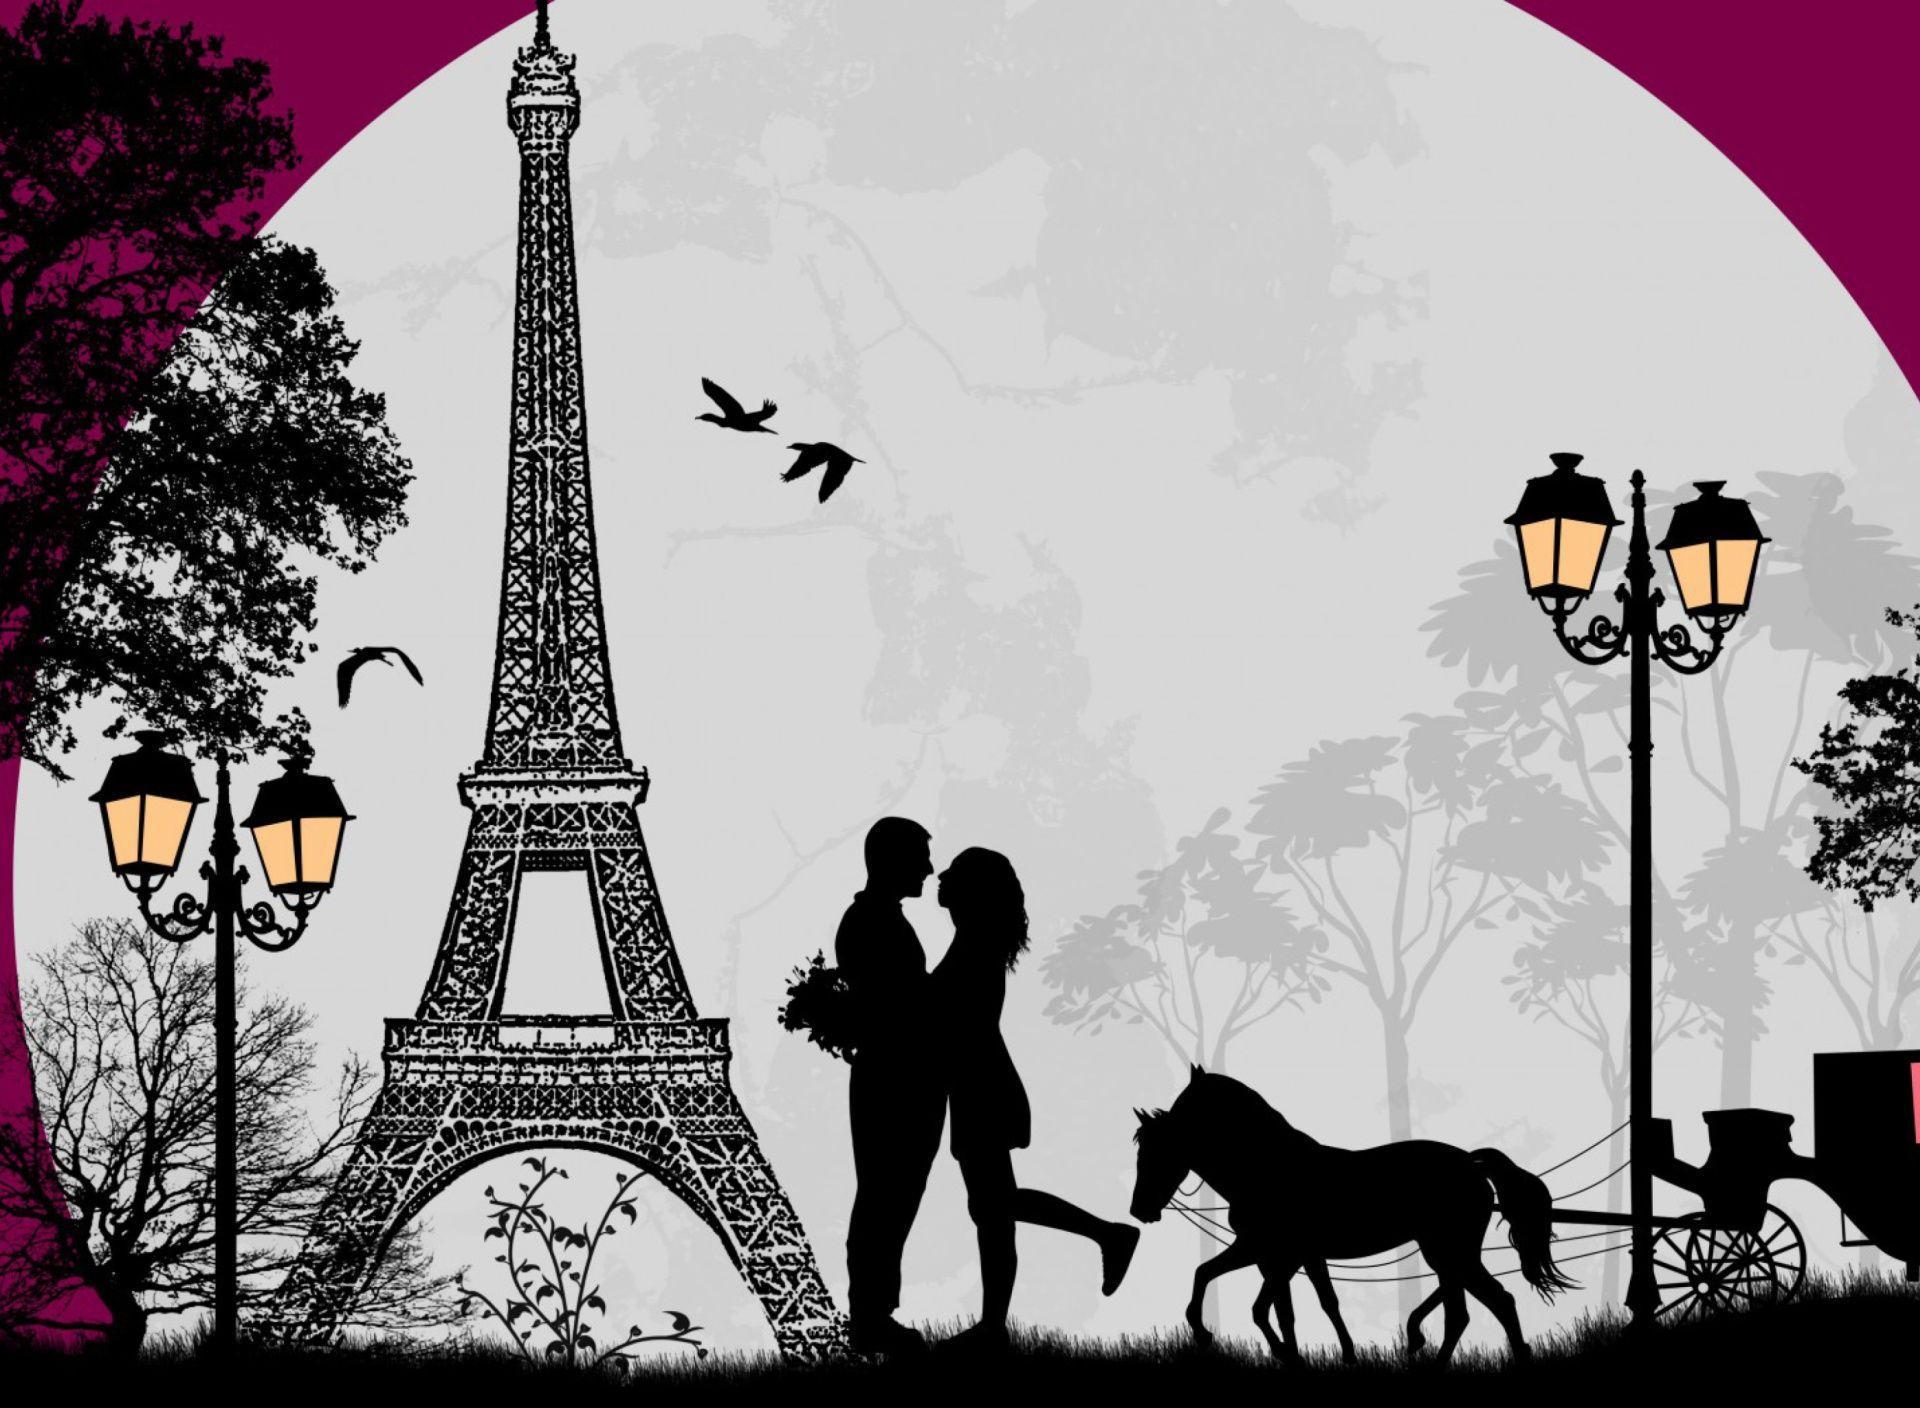 Wallpaper download paris - Valentines Day In Paris Wallpaper Wide Or Hd Digital Art Wallpapers